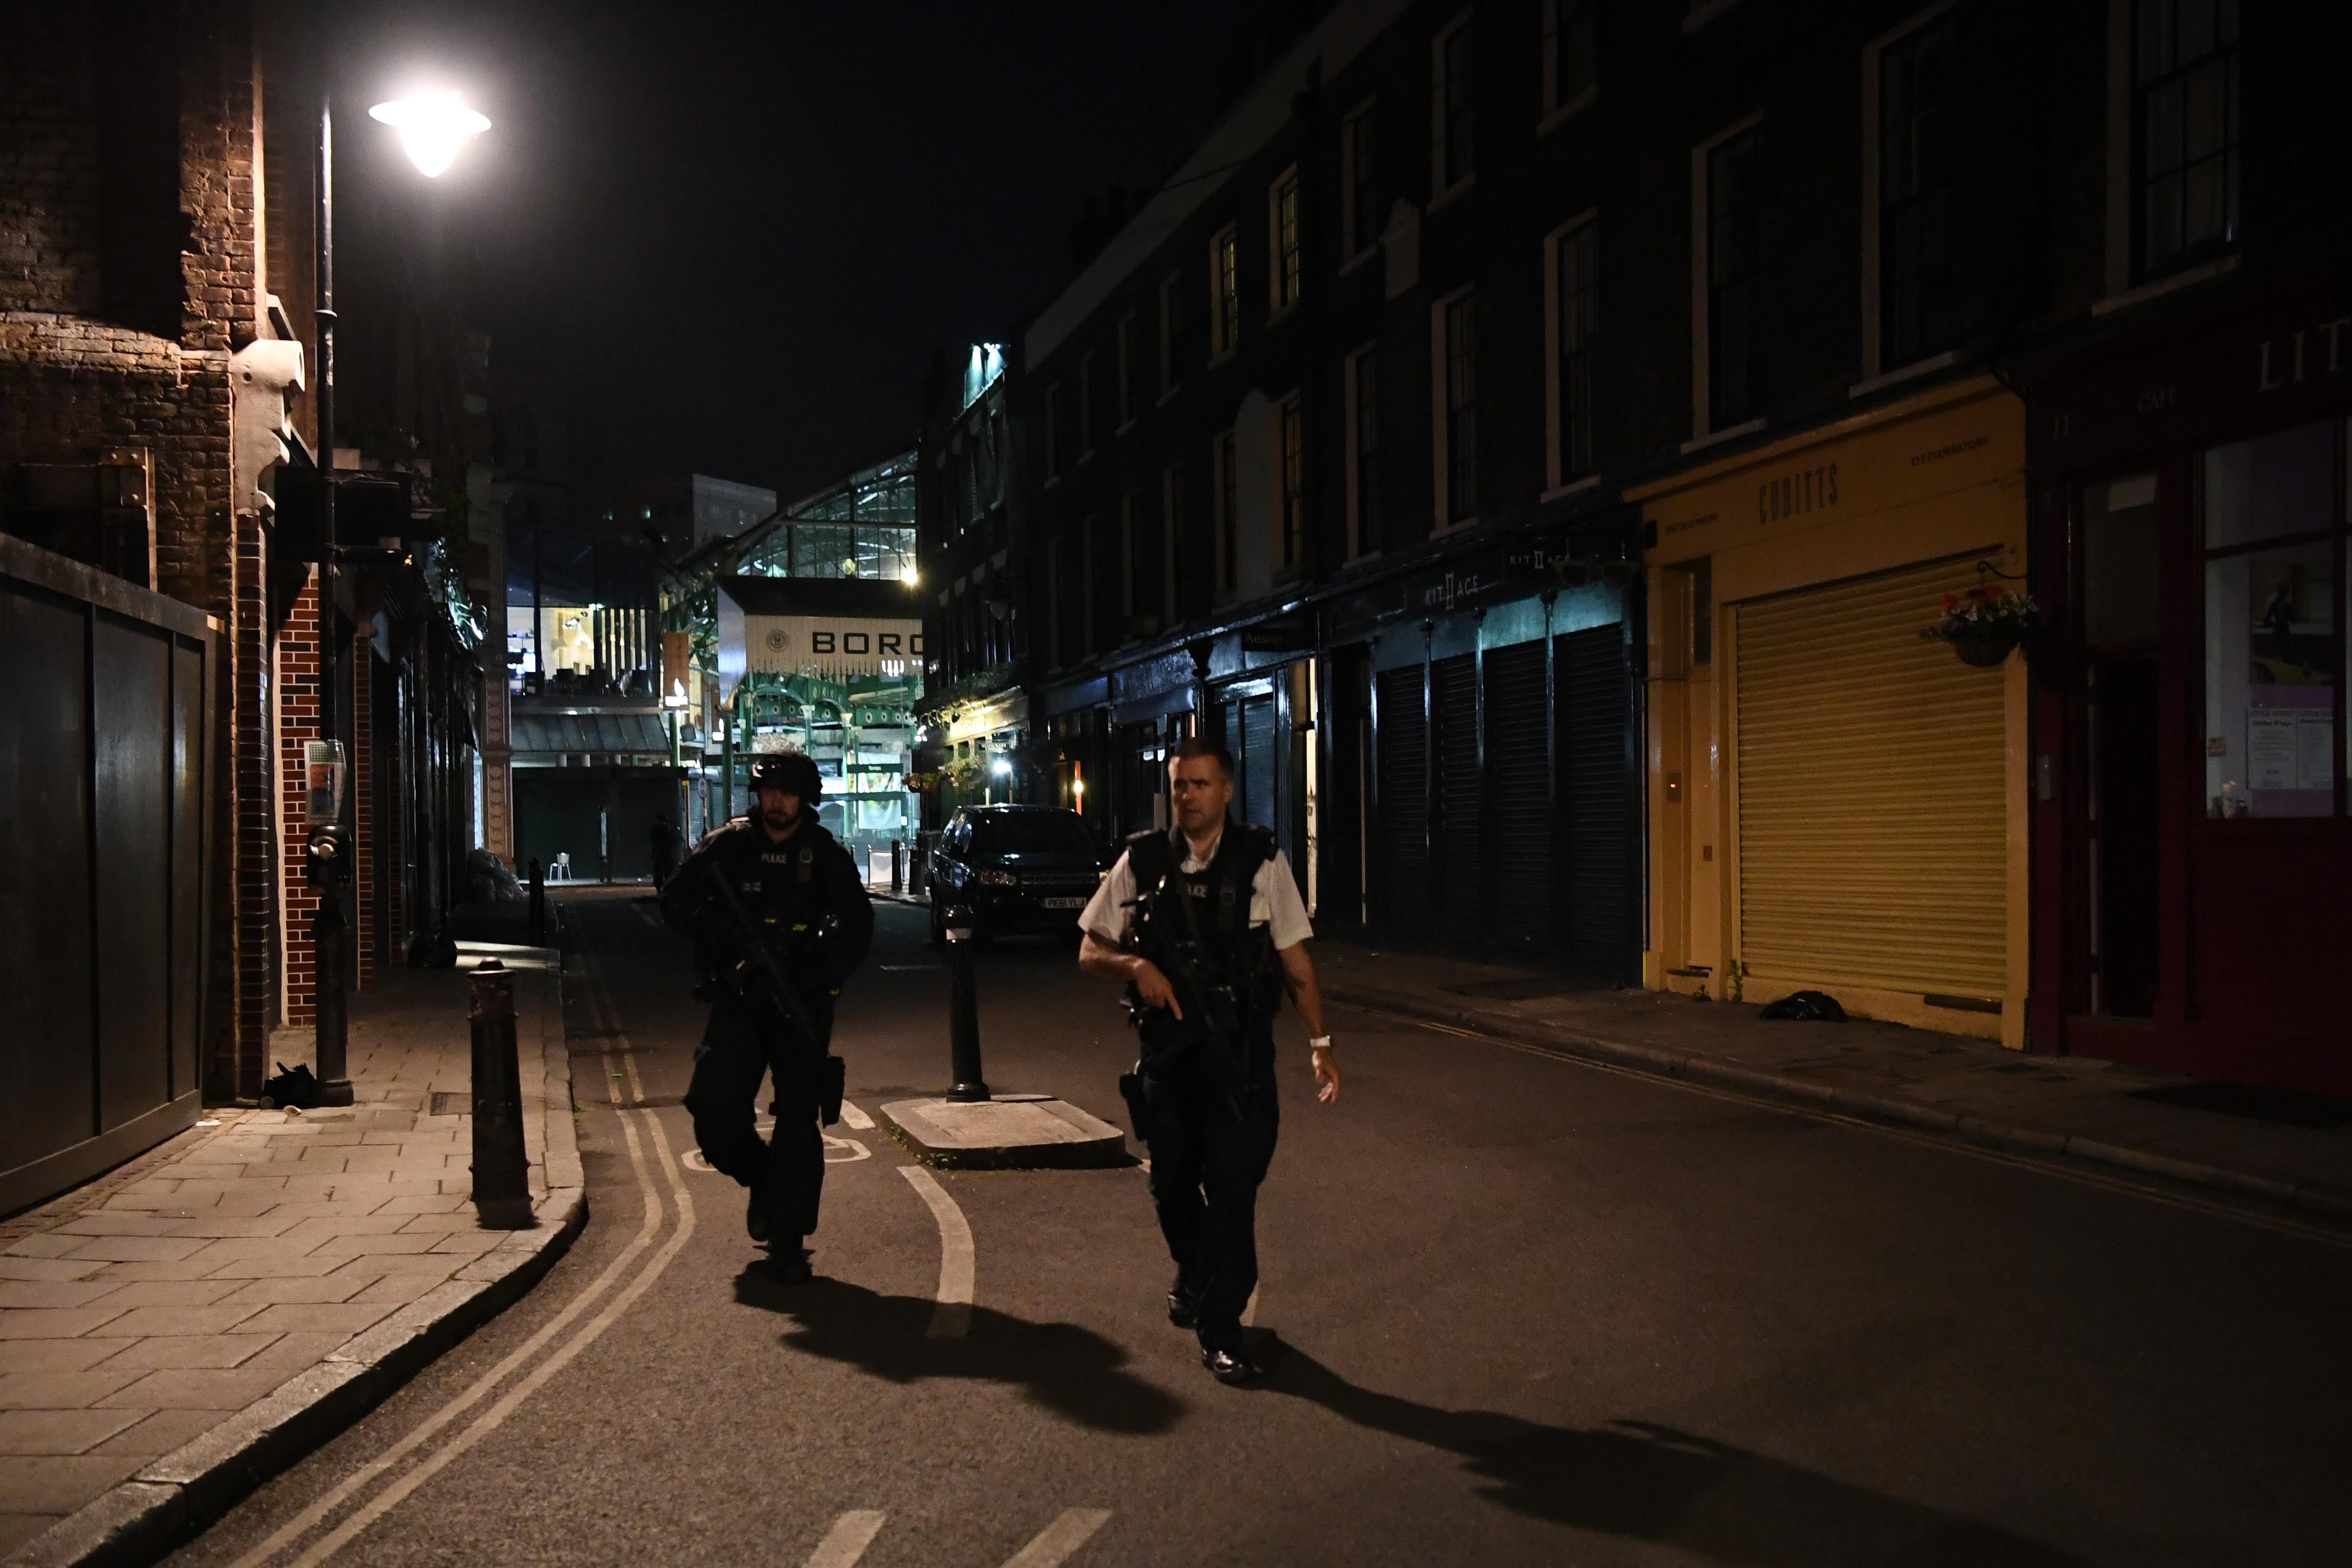 Borough Market police